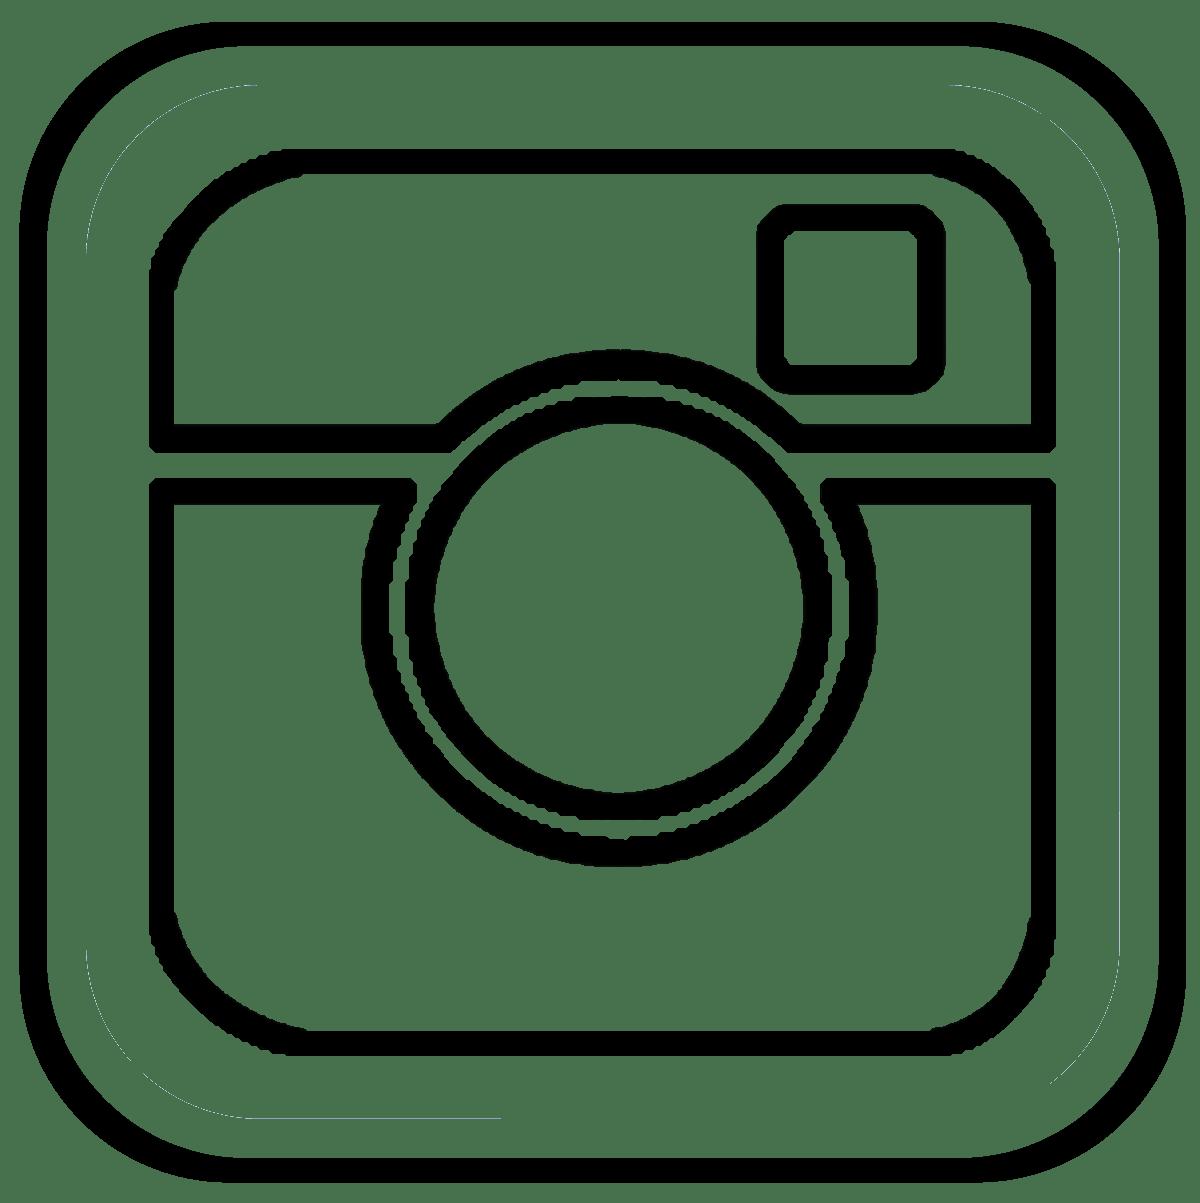 Instagram Clipart Transparent Background